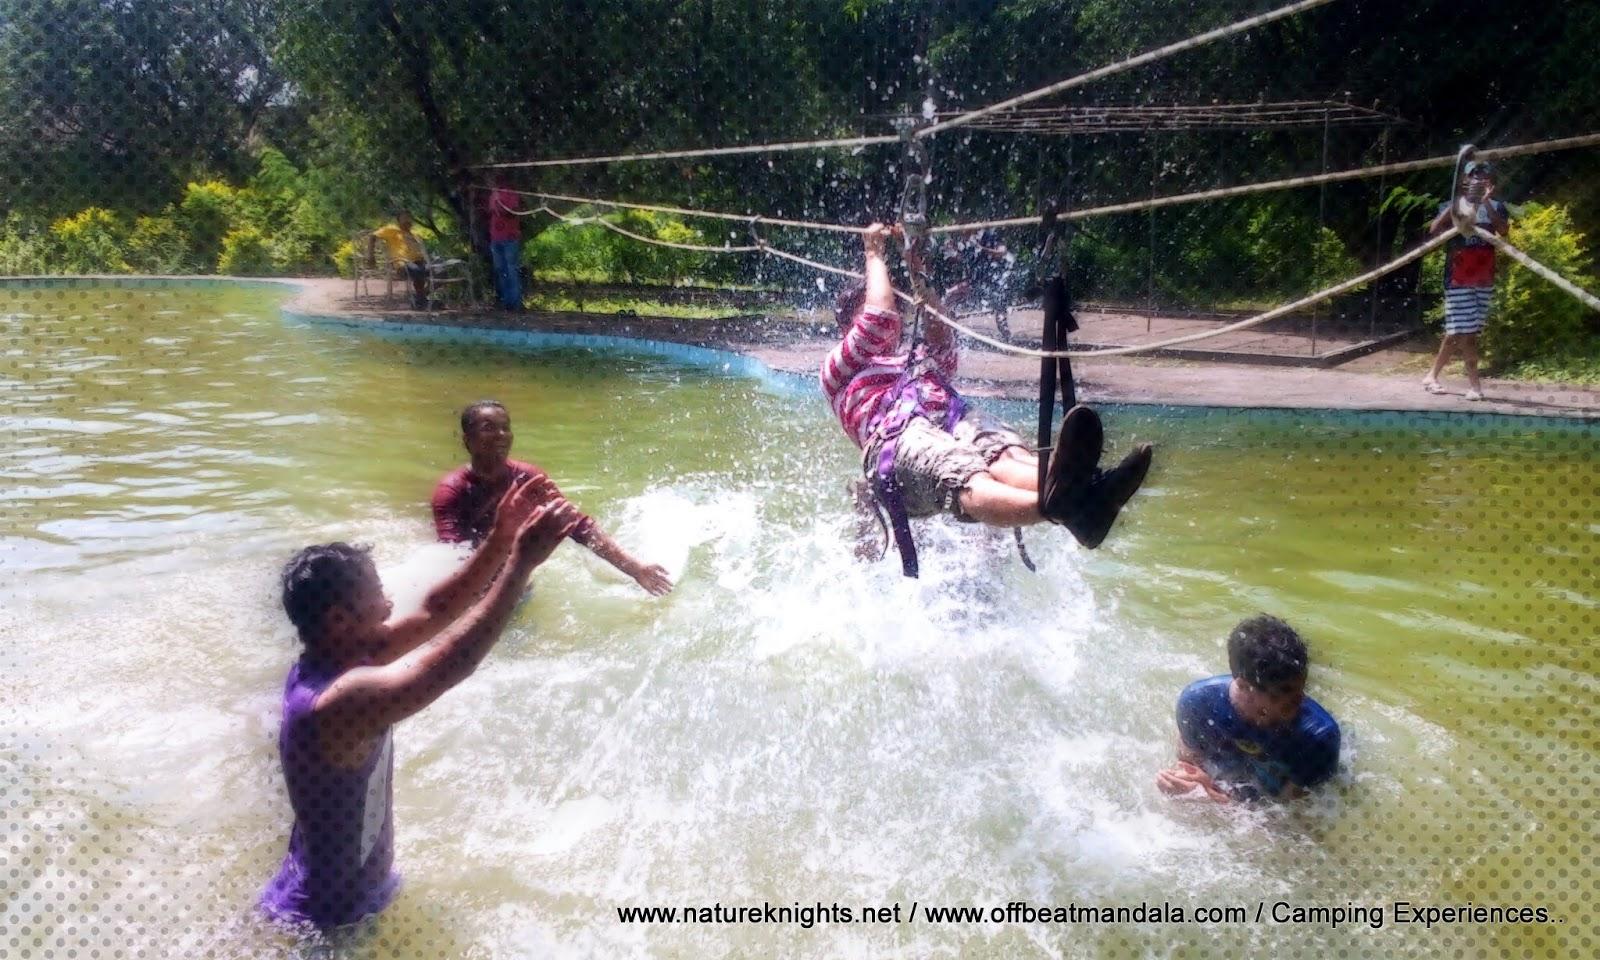 off beat mandala barvi river camp